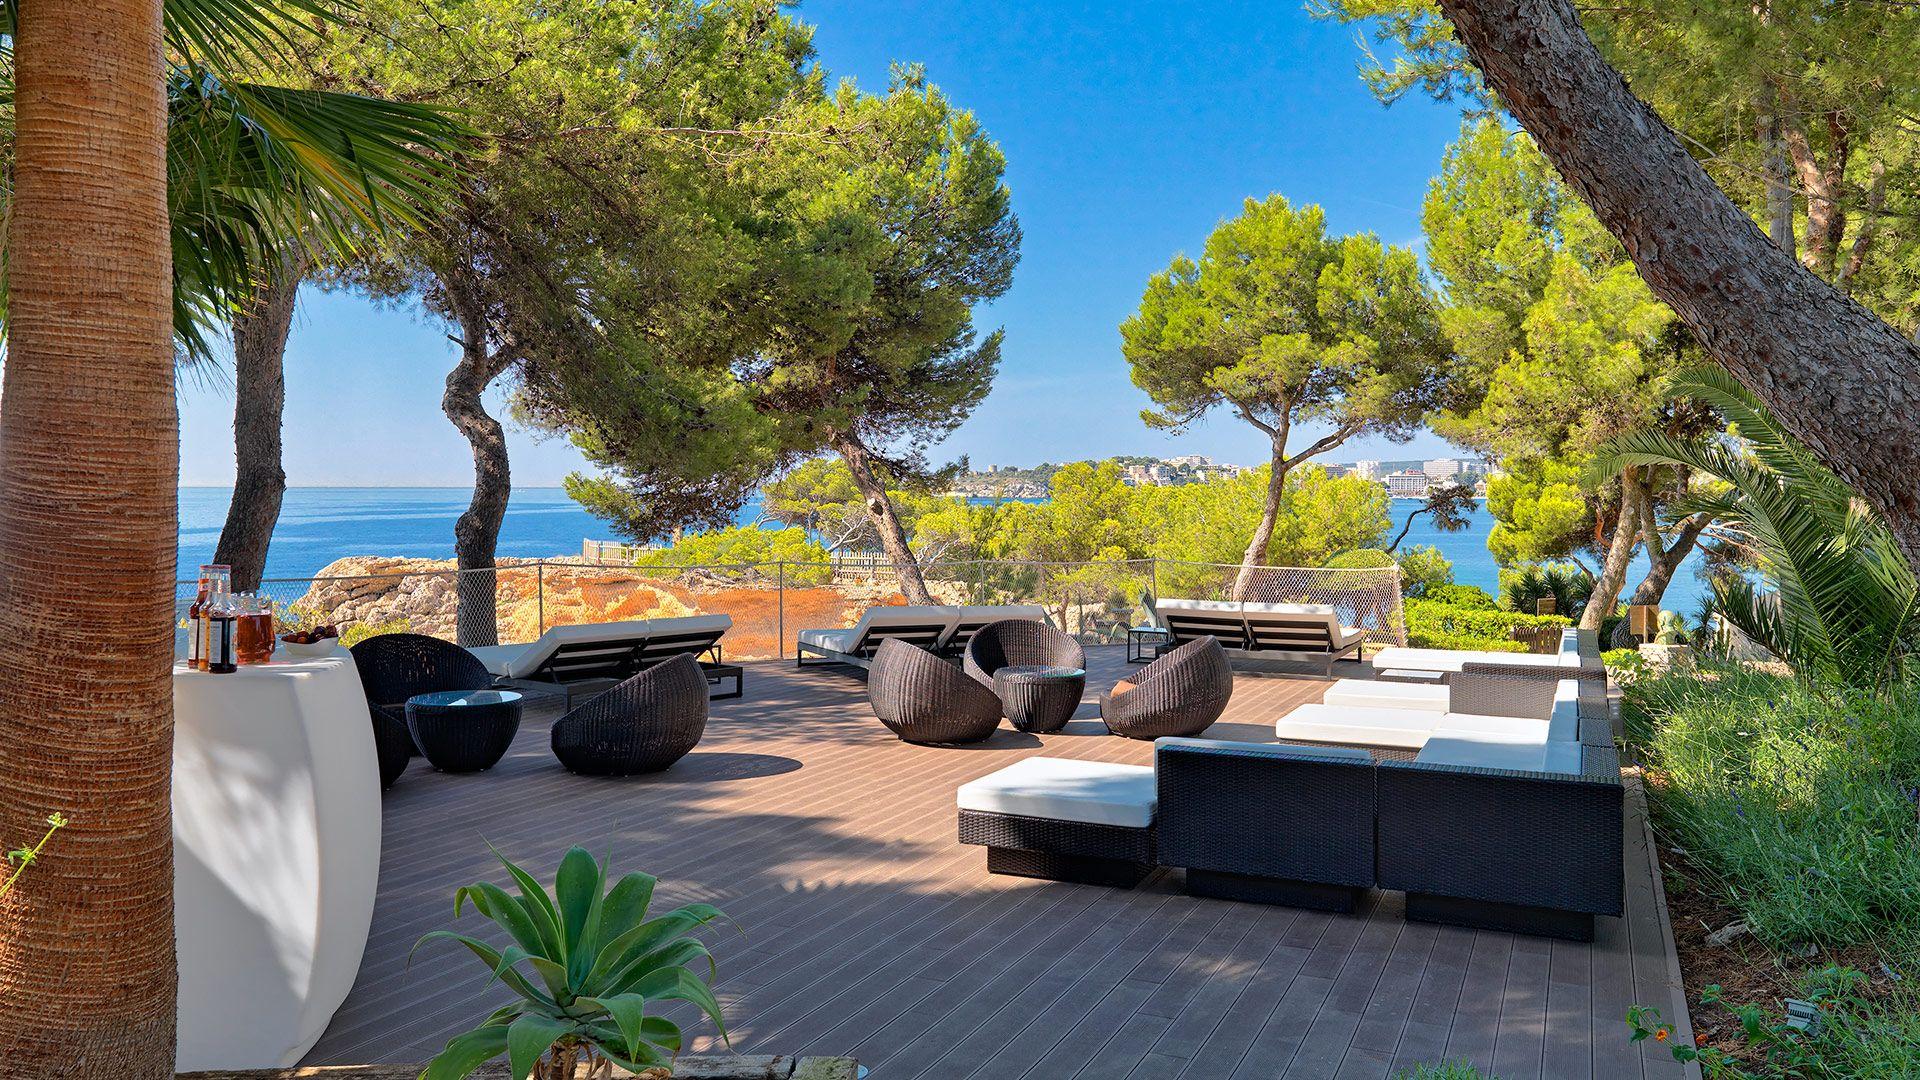 H10 Punta Negra Boutique Hotel - Mallorca - Spanien